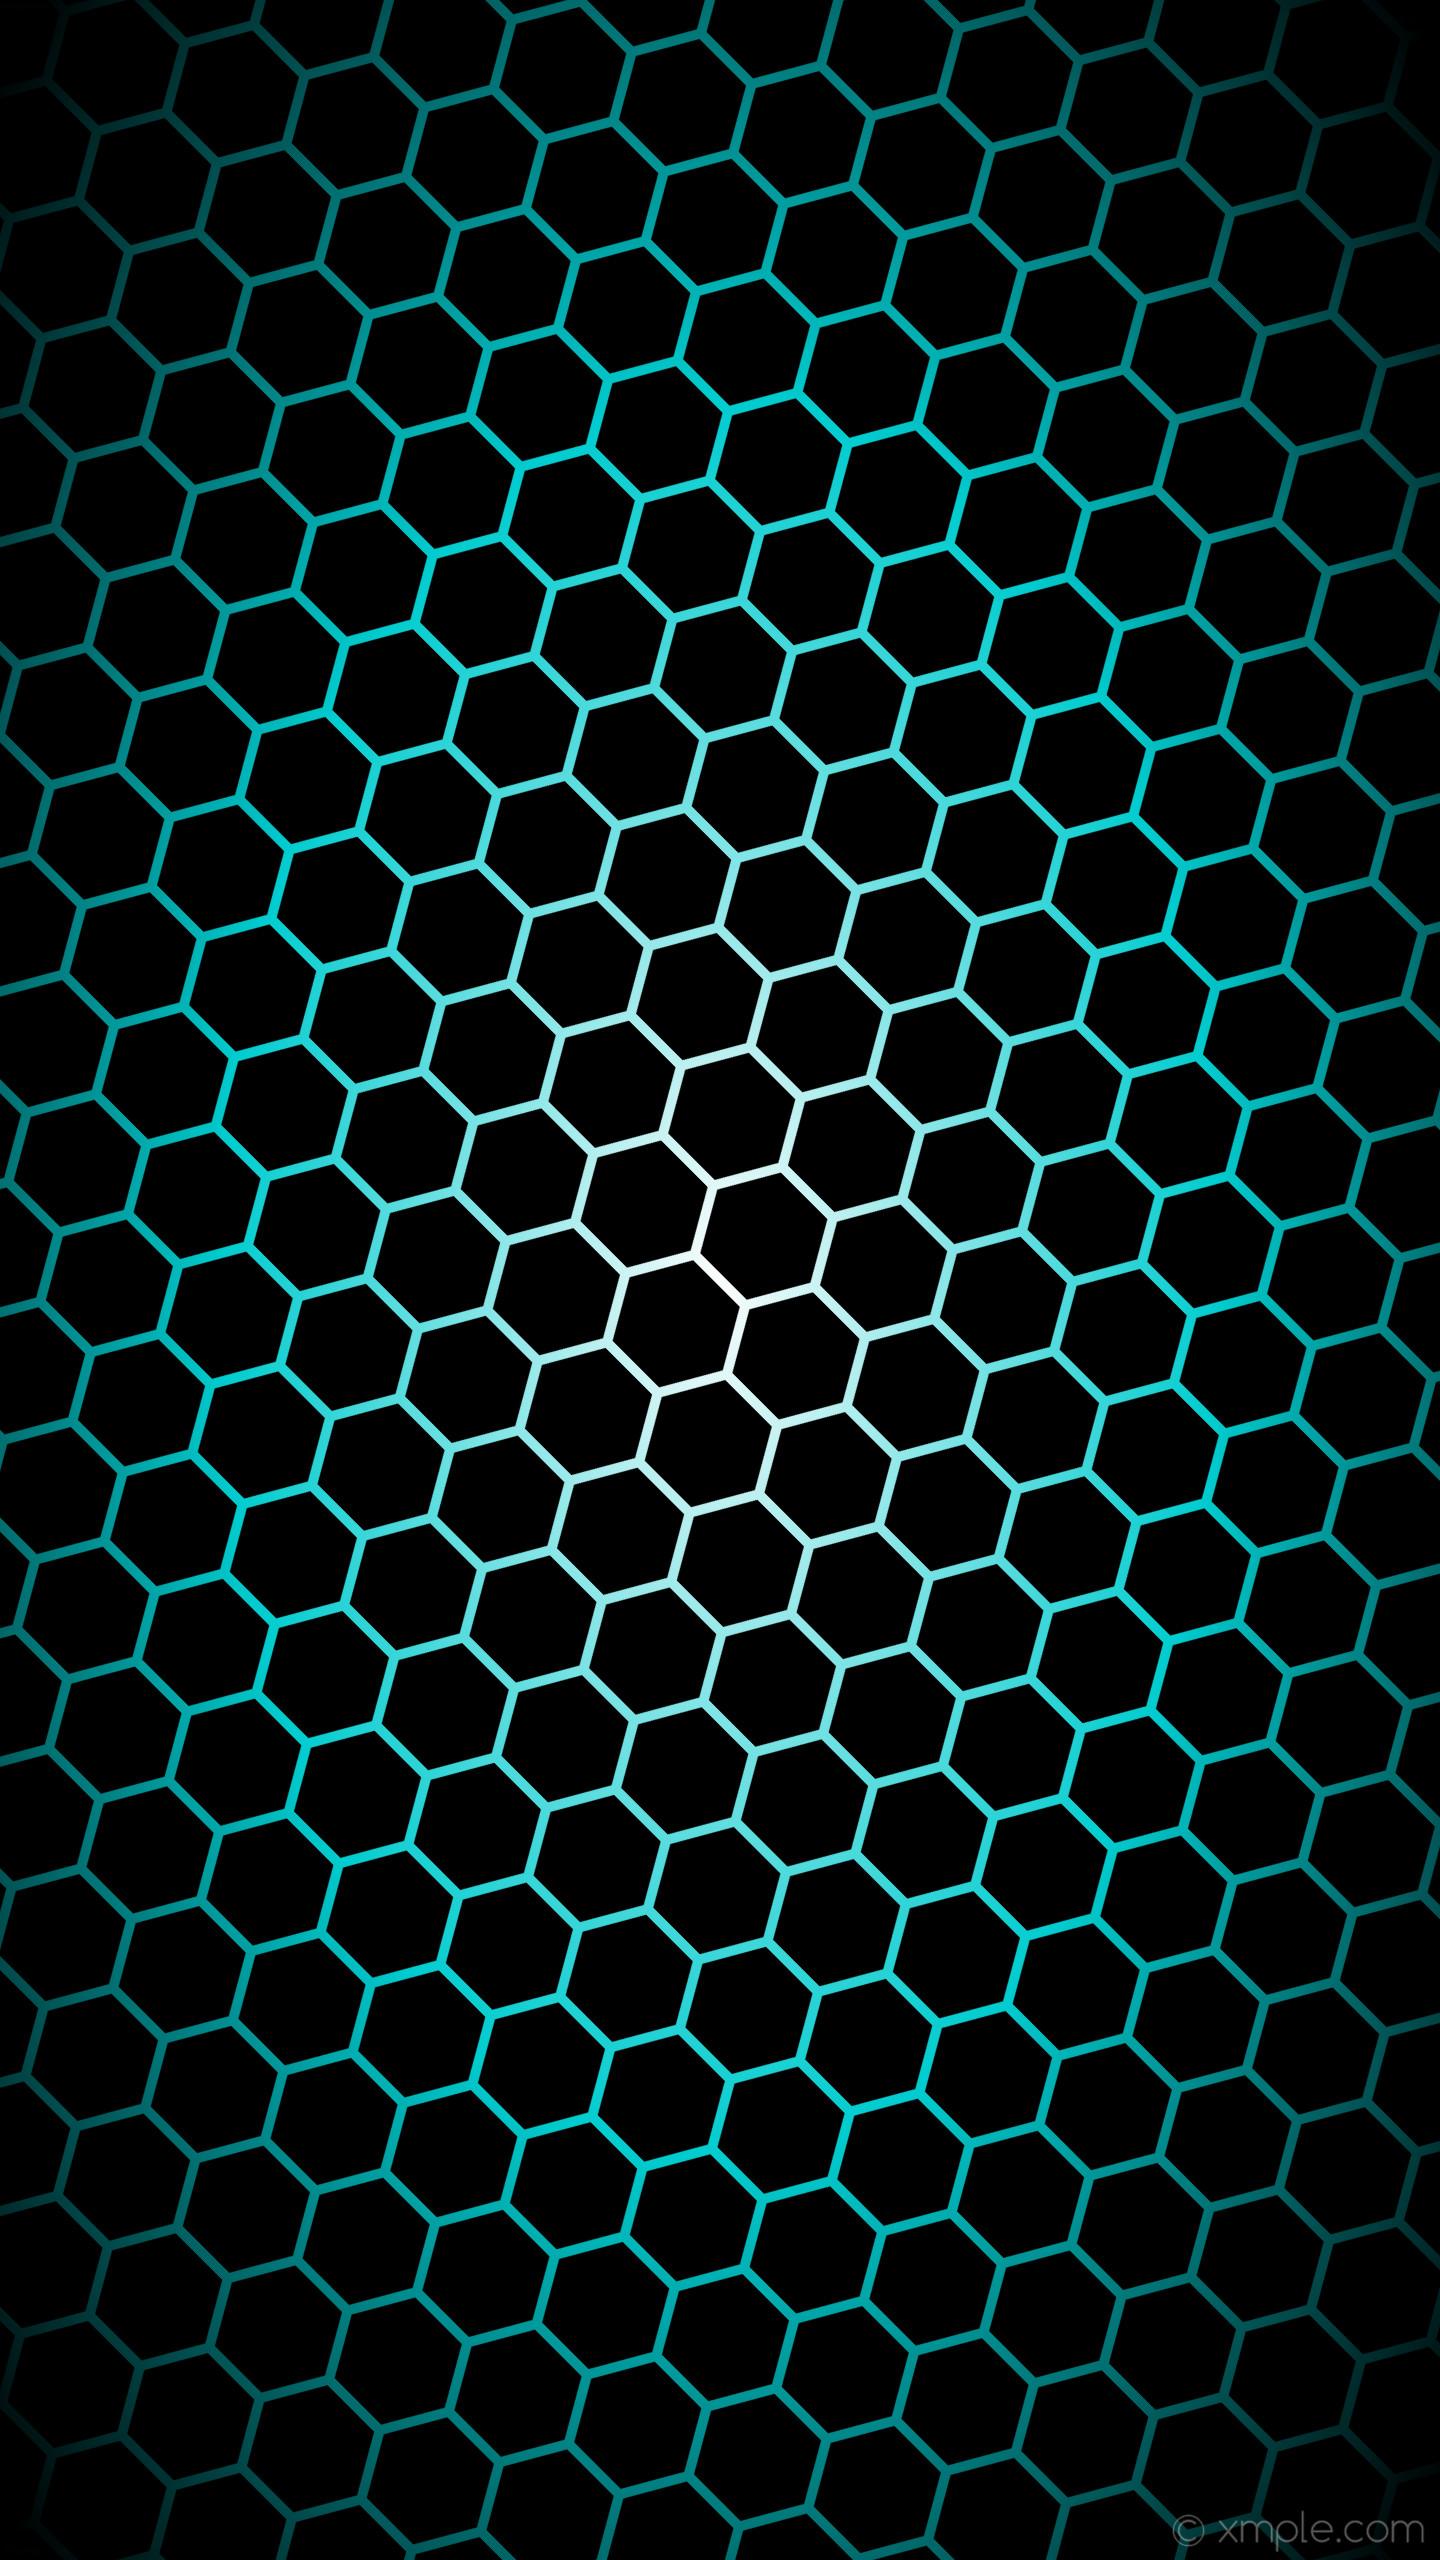 wallpaper white hexagon blue gradient glow black dark turquoise #000000  #ffffff #00ced1 diagonal